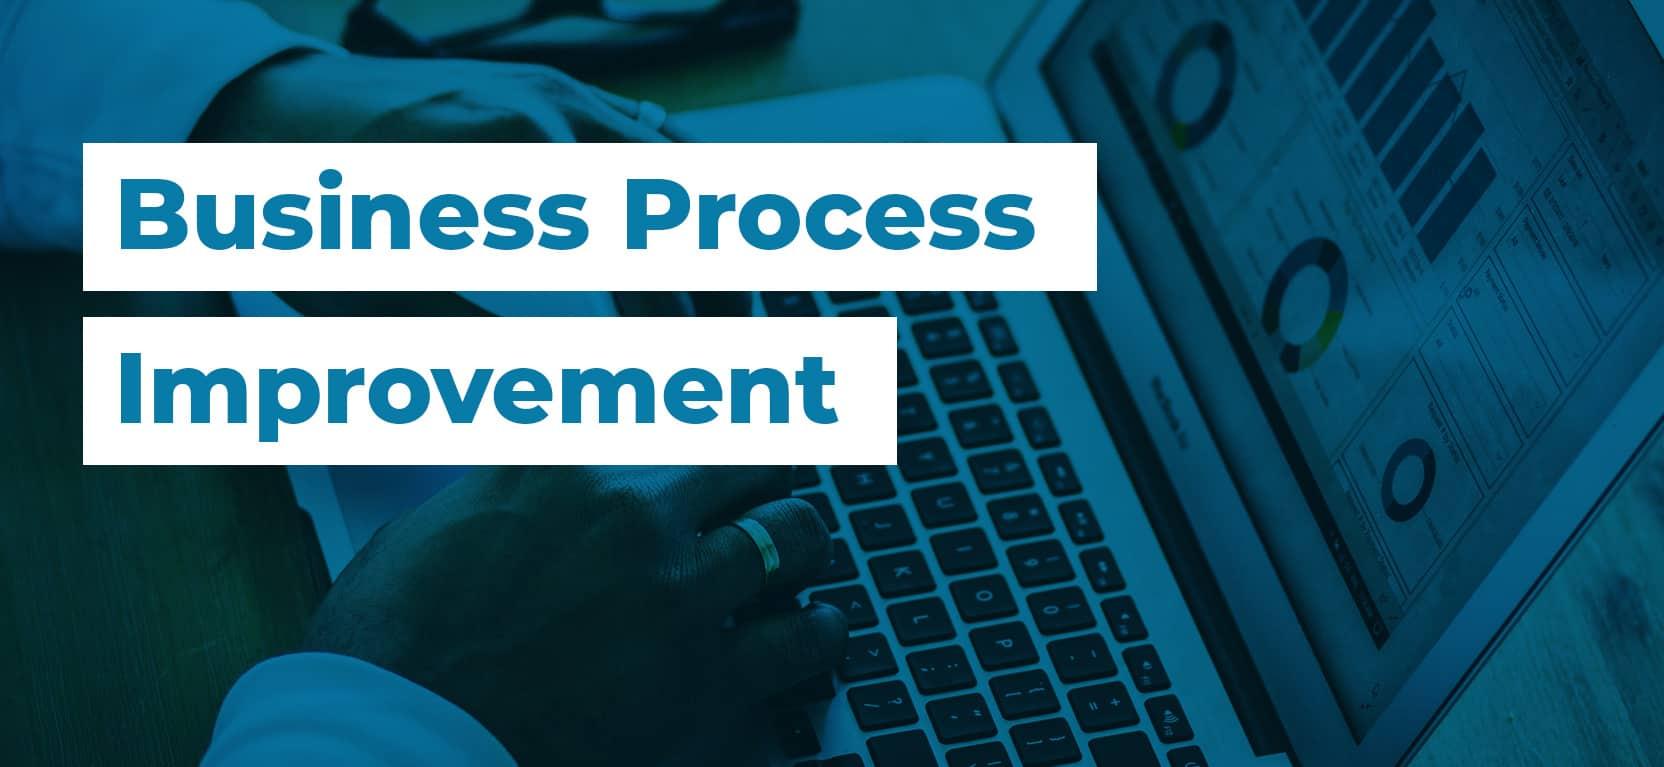 40 Business Process Improvement3 1